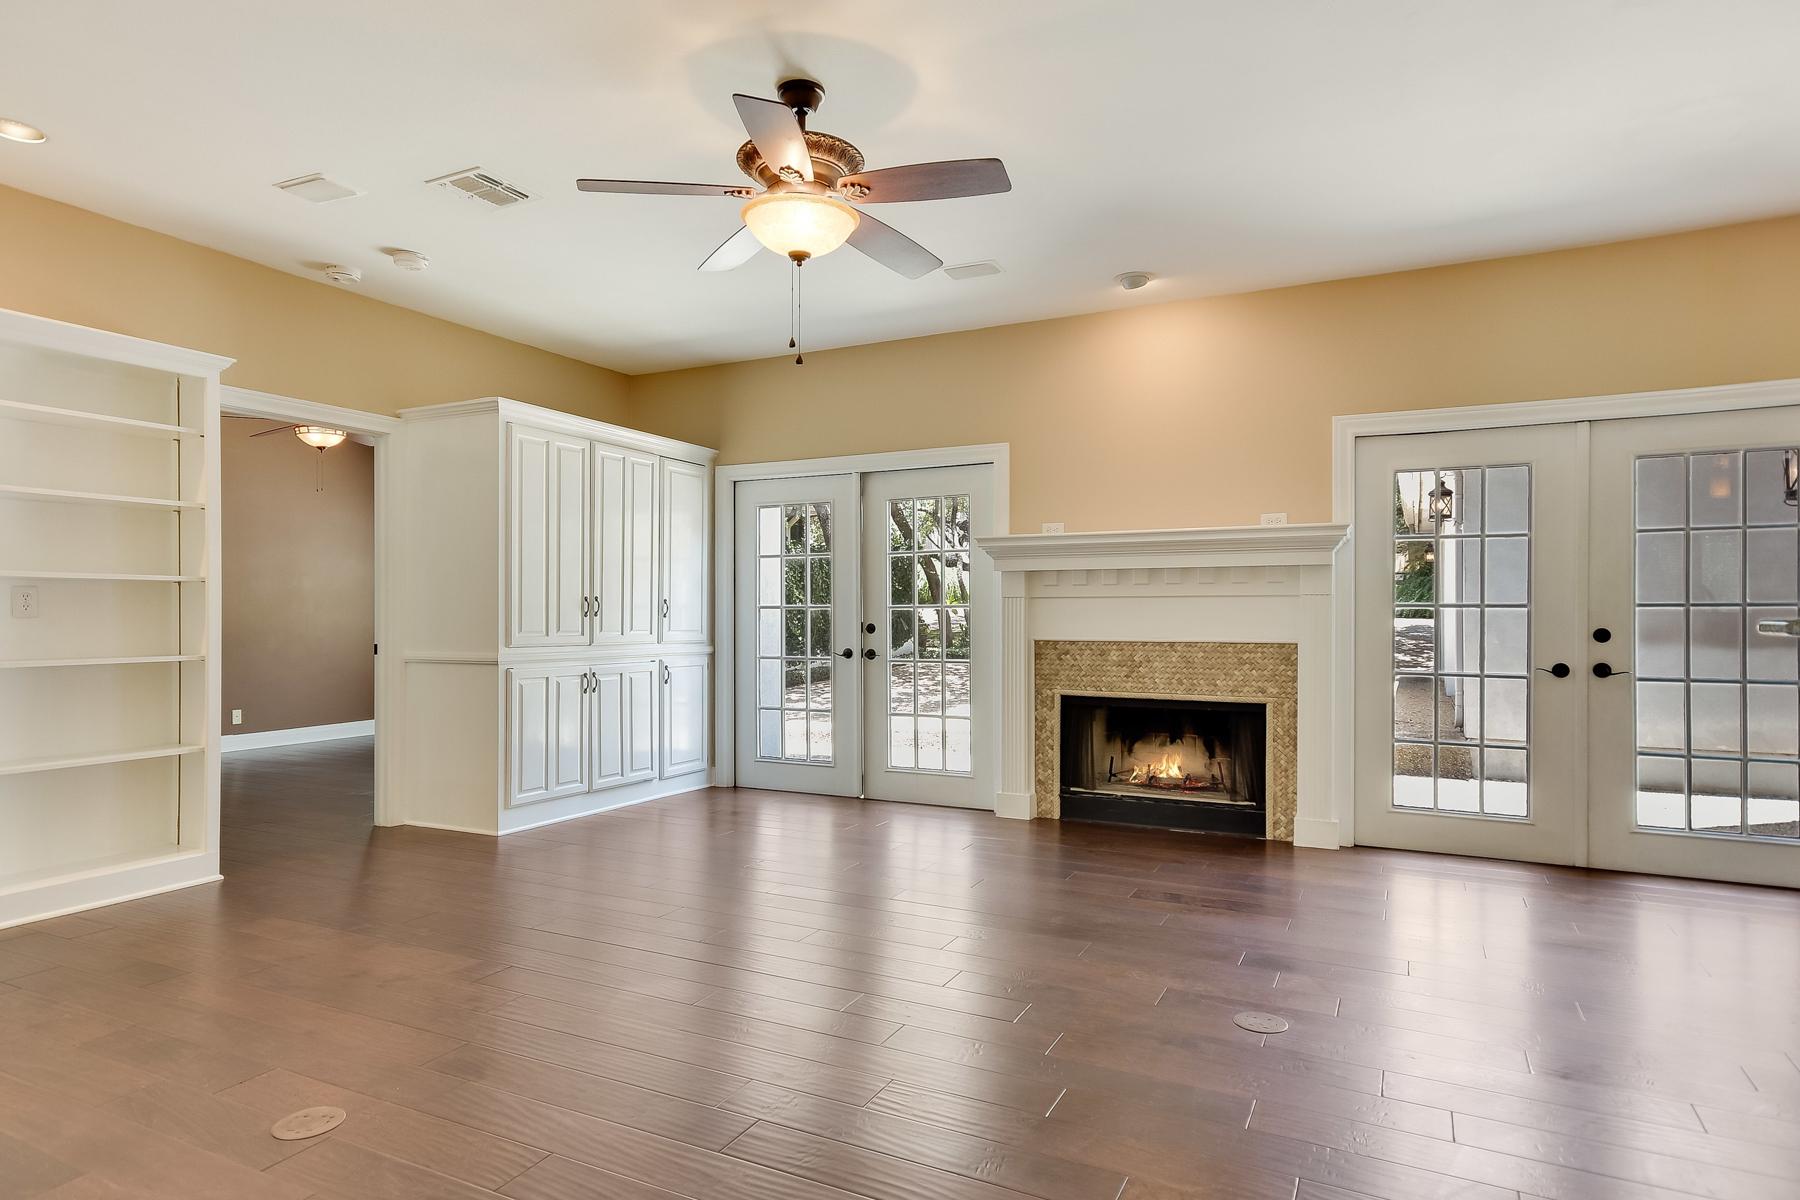 Additional photo for property listing at Stunning Gem in Dominion Cottage Estates 36 Stratton Ln San Antonio, Texas 78257 Estados Unidos